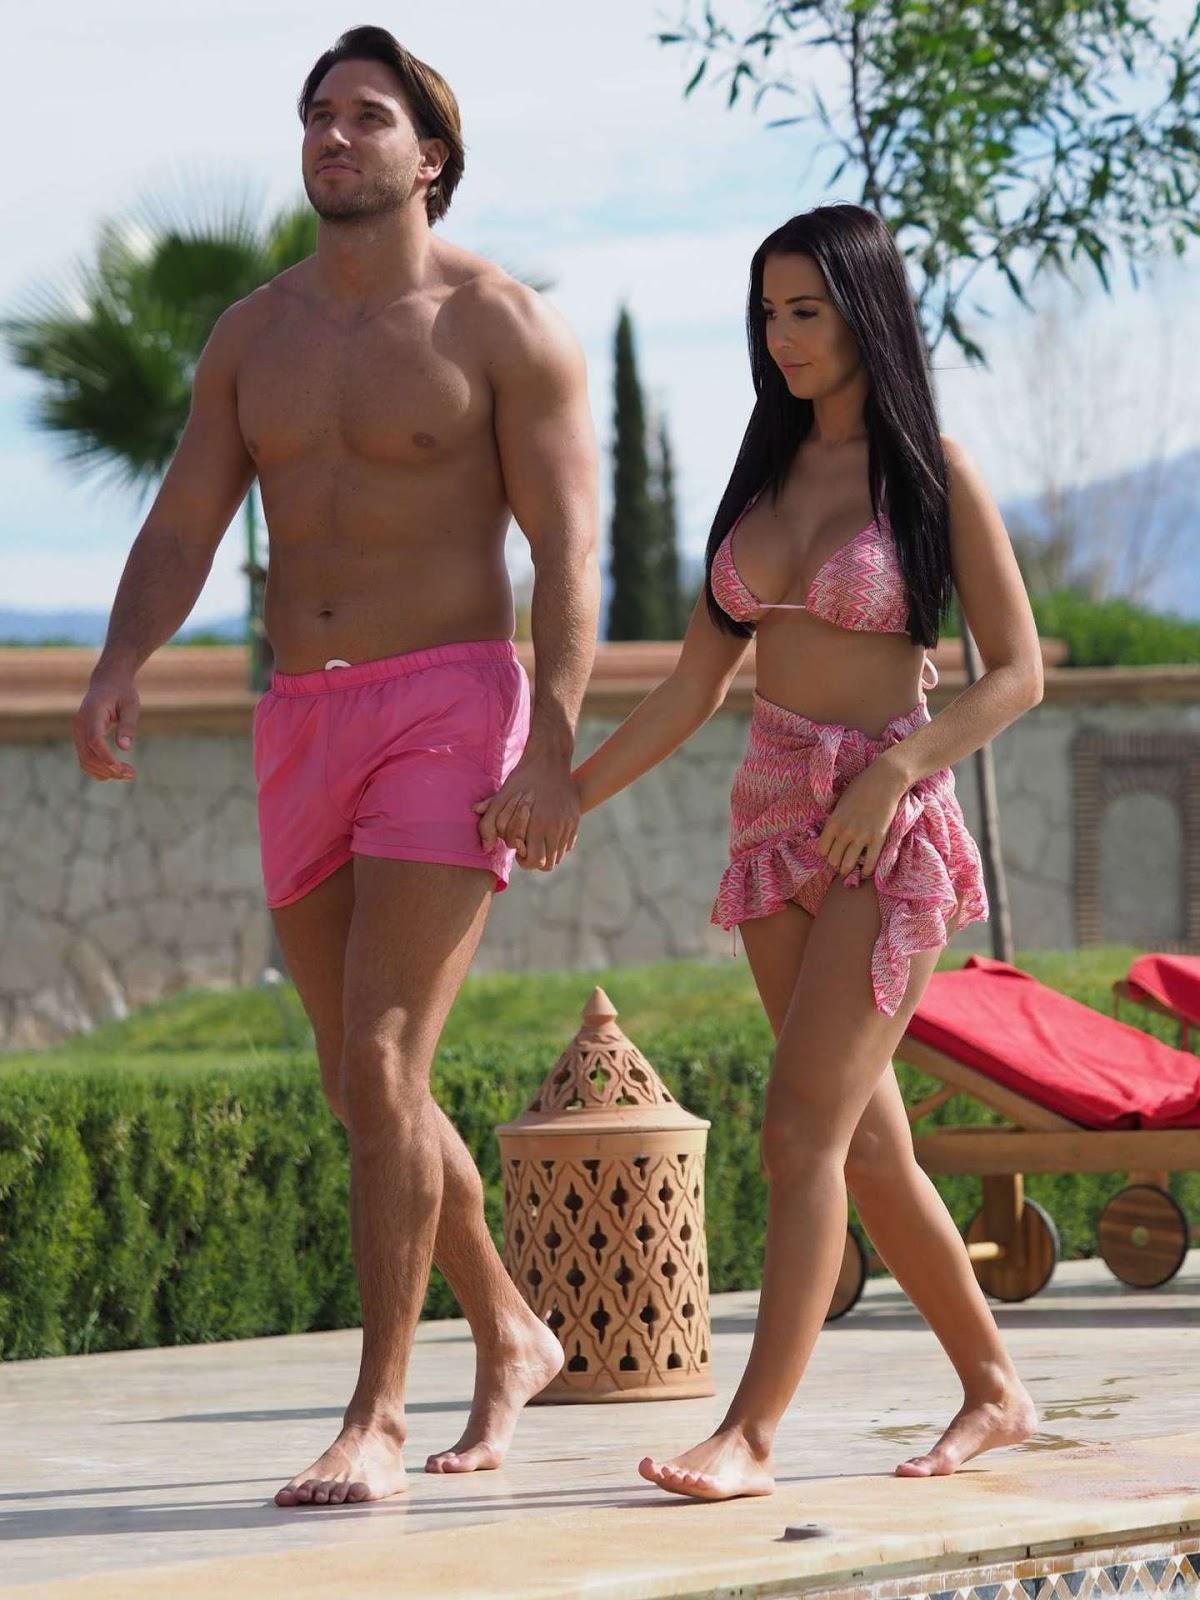 Yazmin Oukhellou in Bikini on Holiday in Morocco